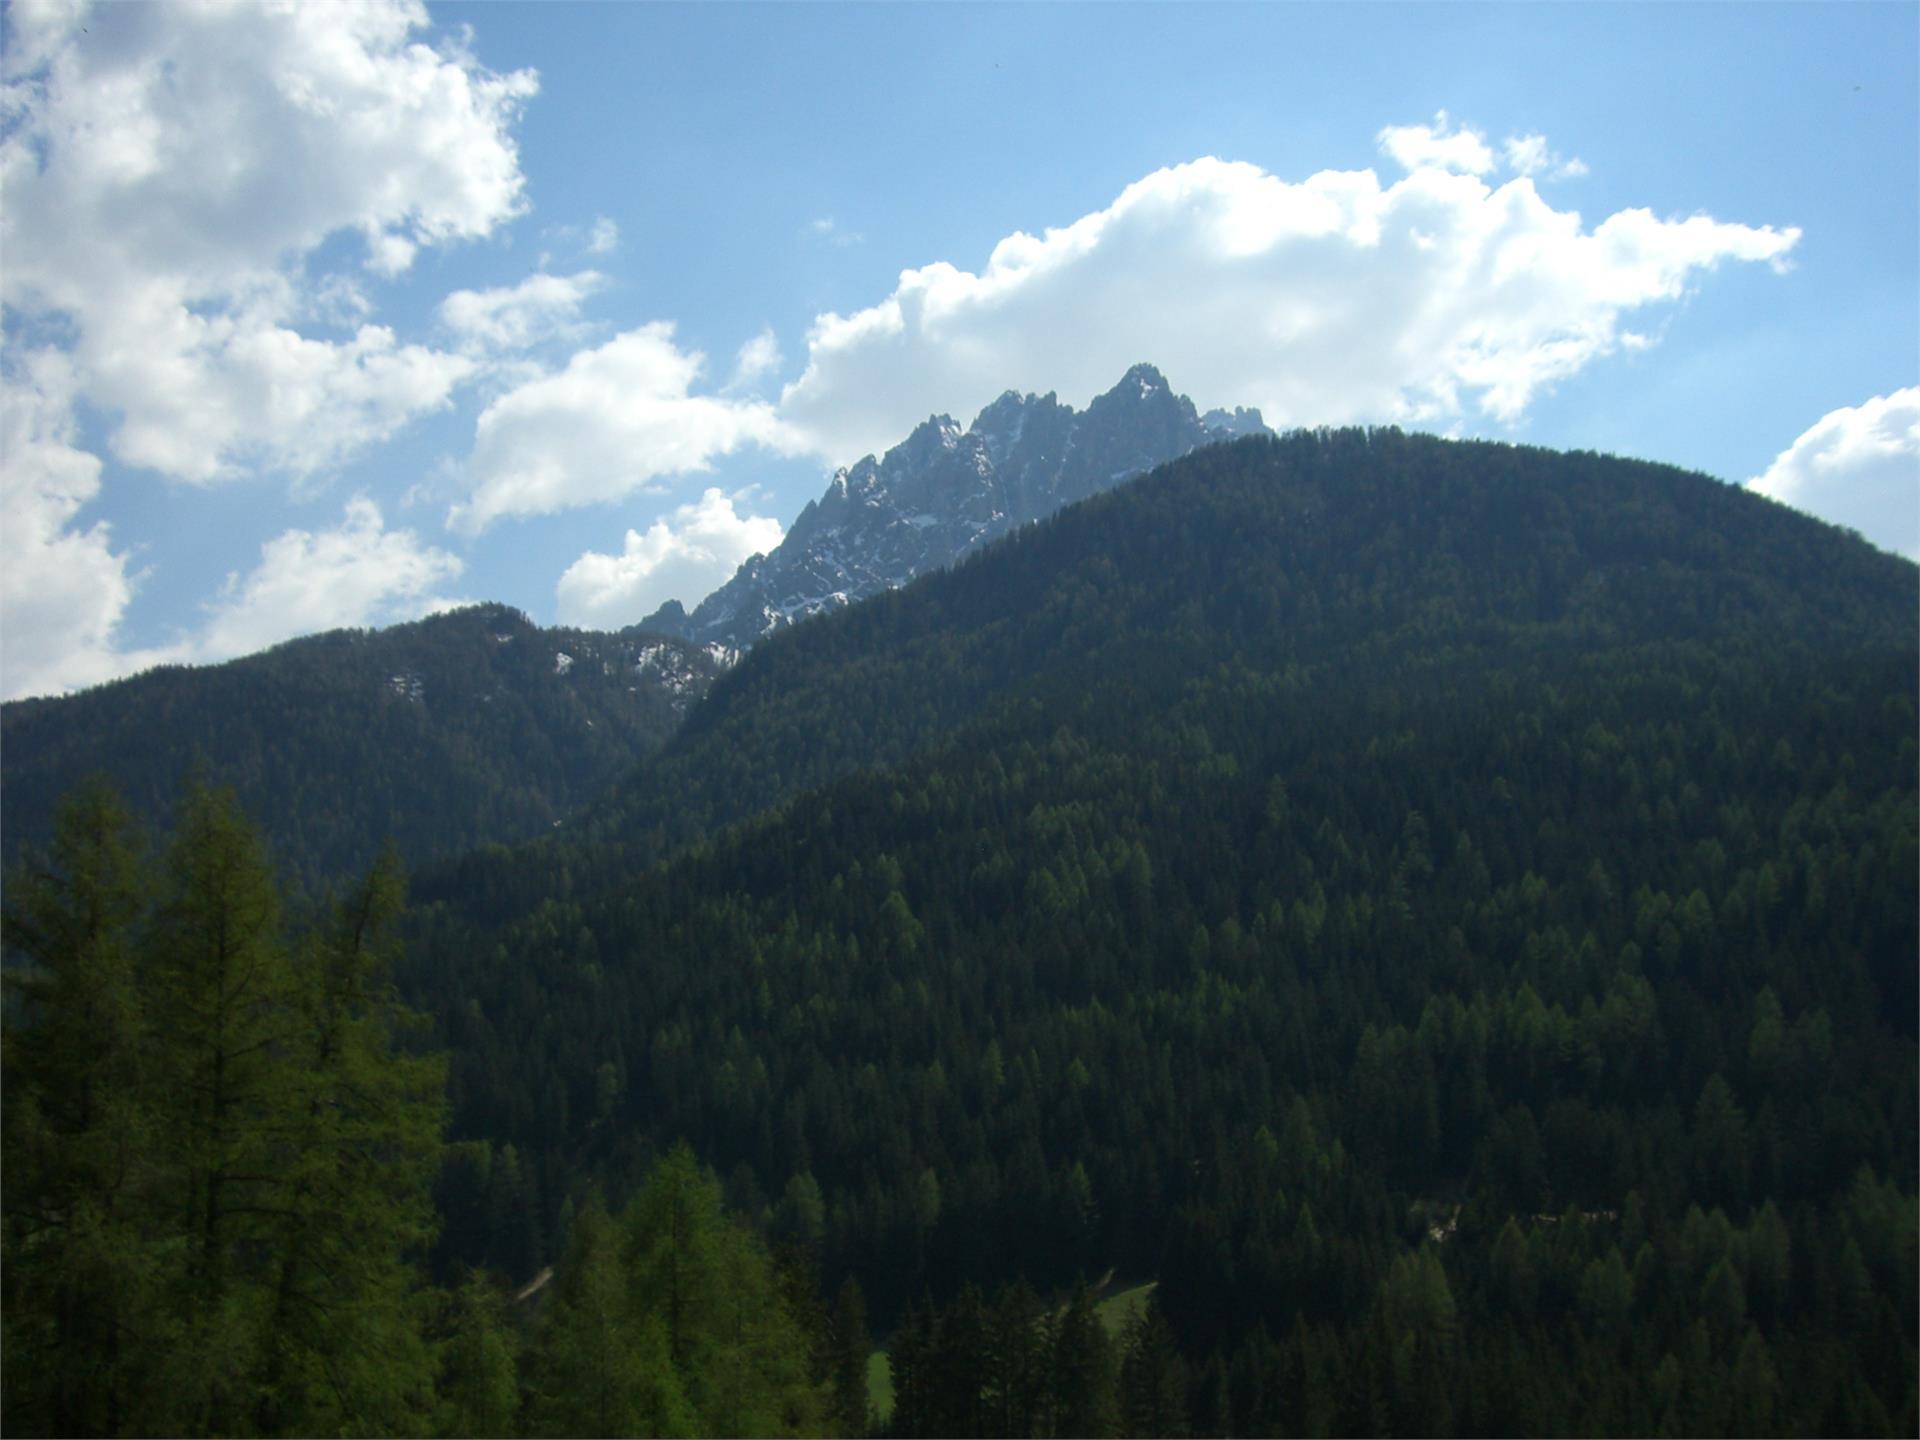 Escursione estiva: Dobbiaco Nuova - Elsler Kaser - San Candido